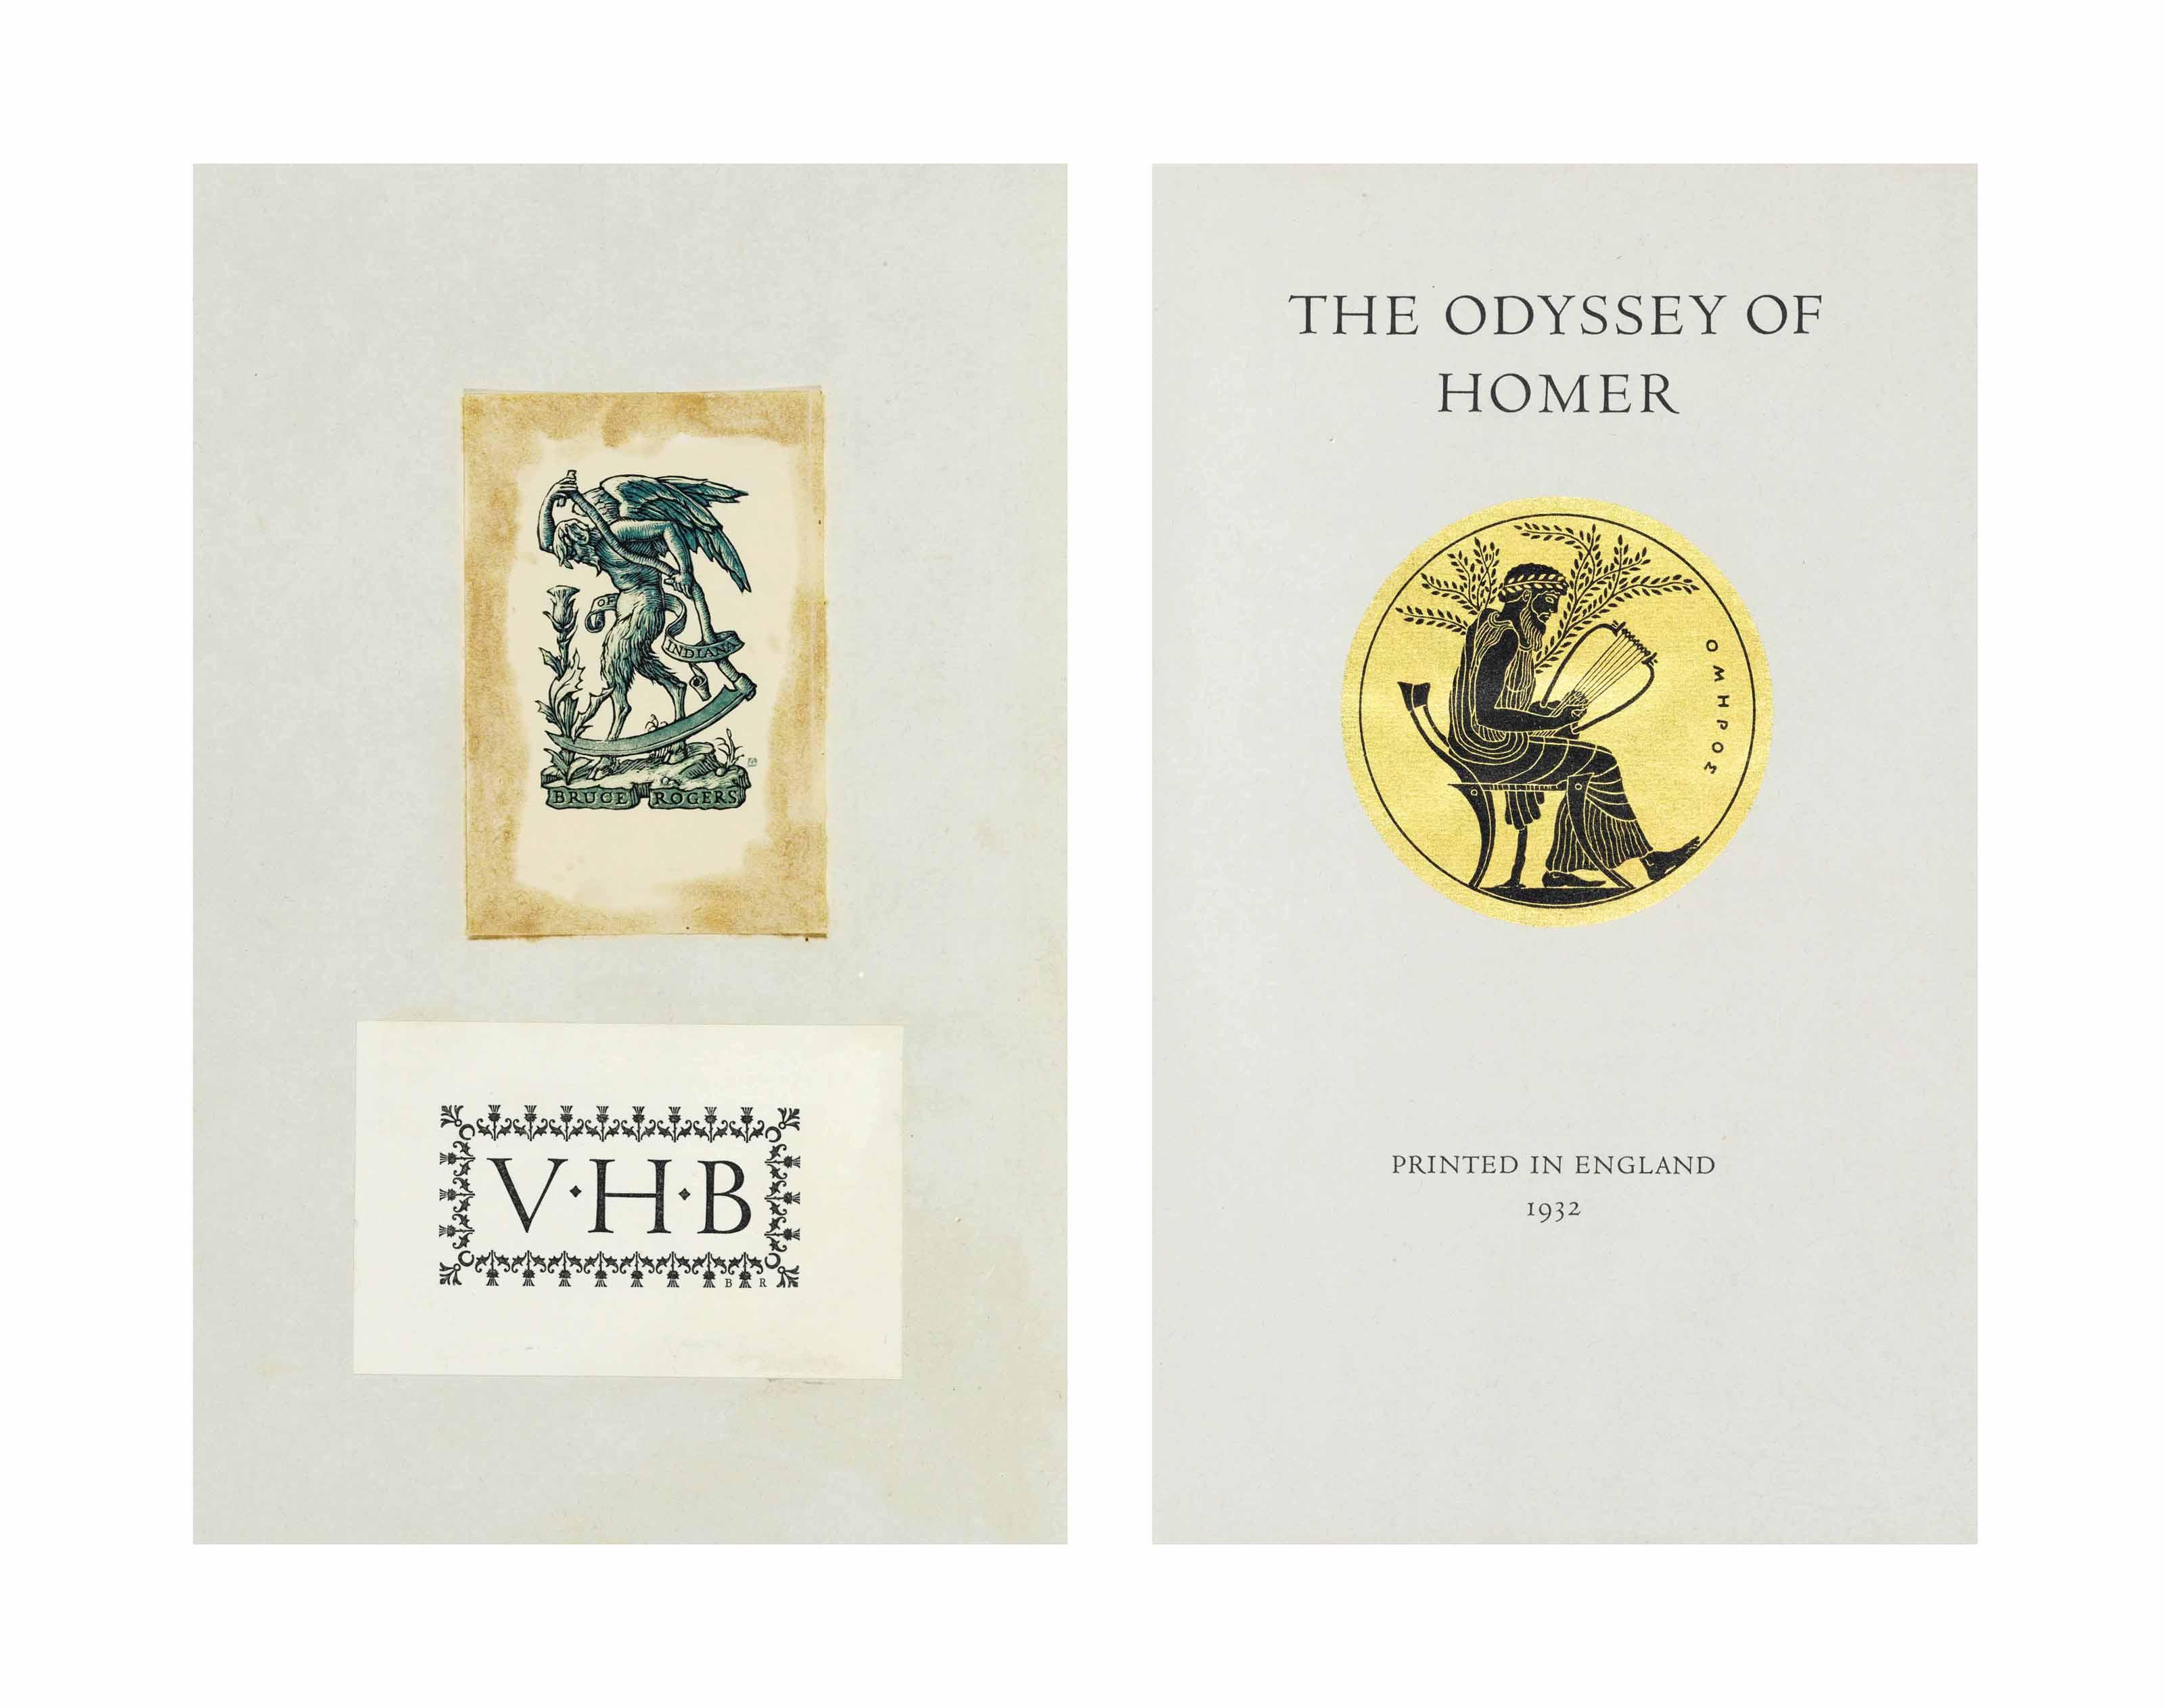 LAWRENCE, T. E., translator. – HOMER. The Odyssey of Homer. London: Sir Emery Walker, Wilfred Merton and Bruce Rogers, 1932.